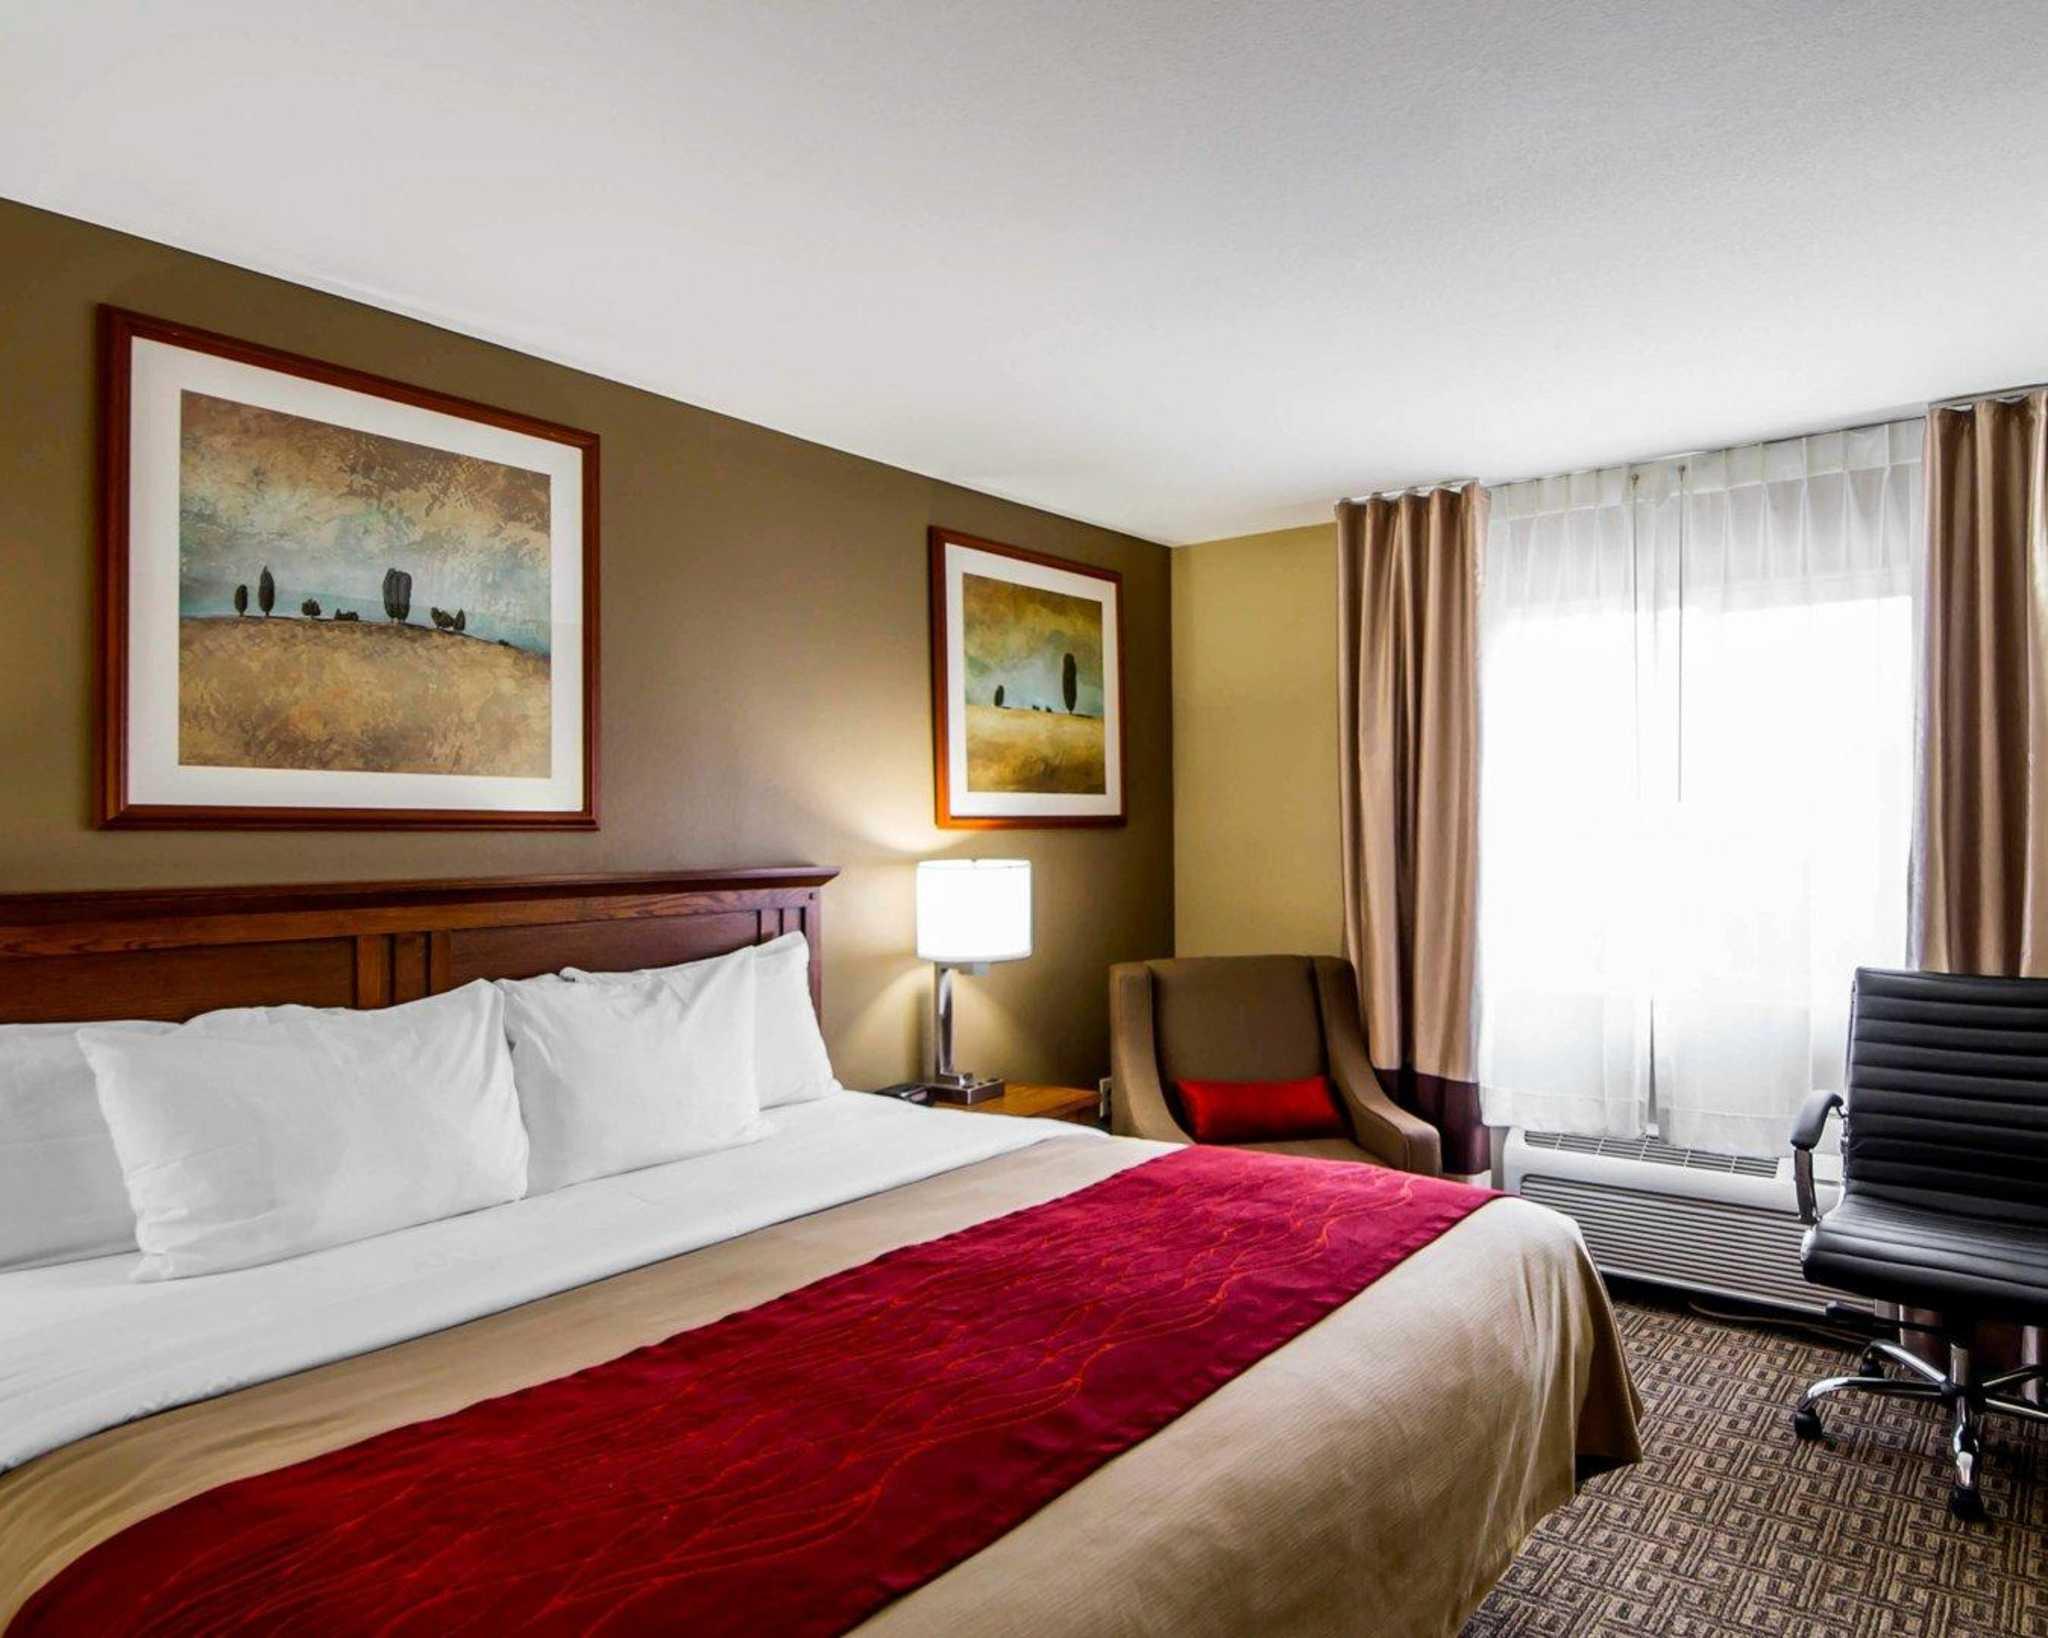 Comfort Inn Amp Suites In Ponca City Ok 74604